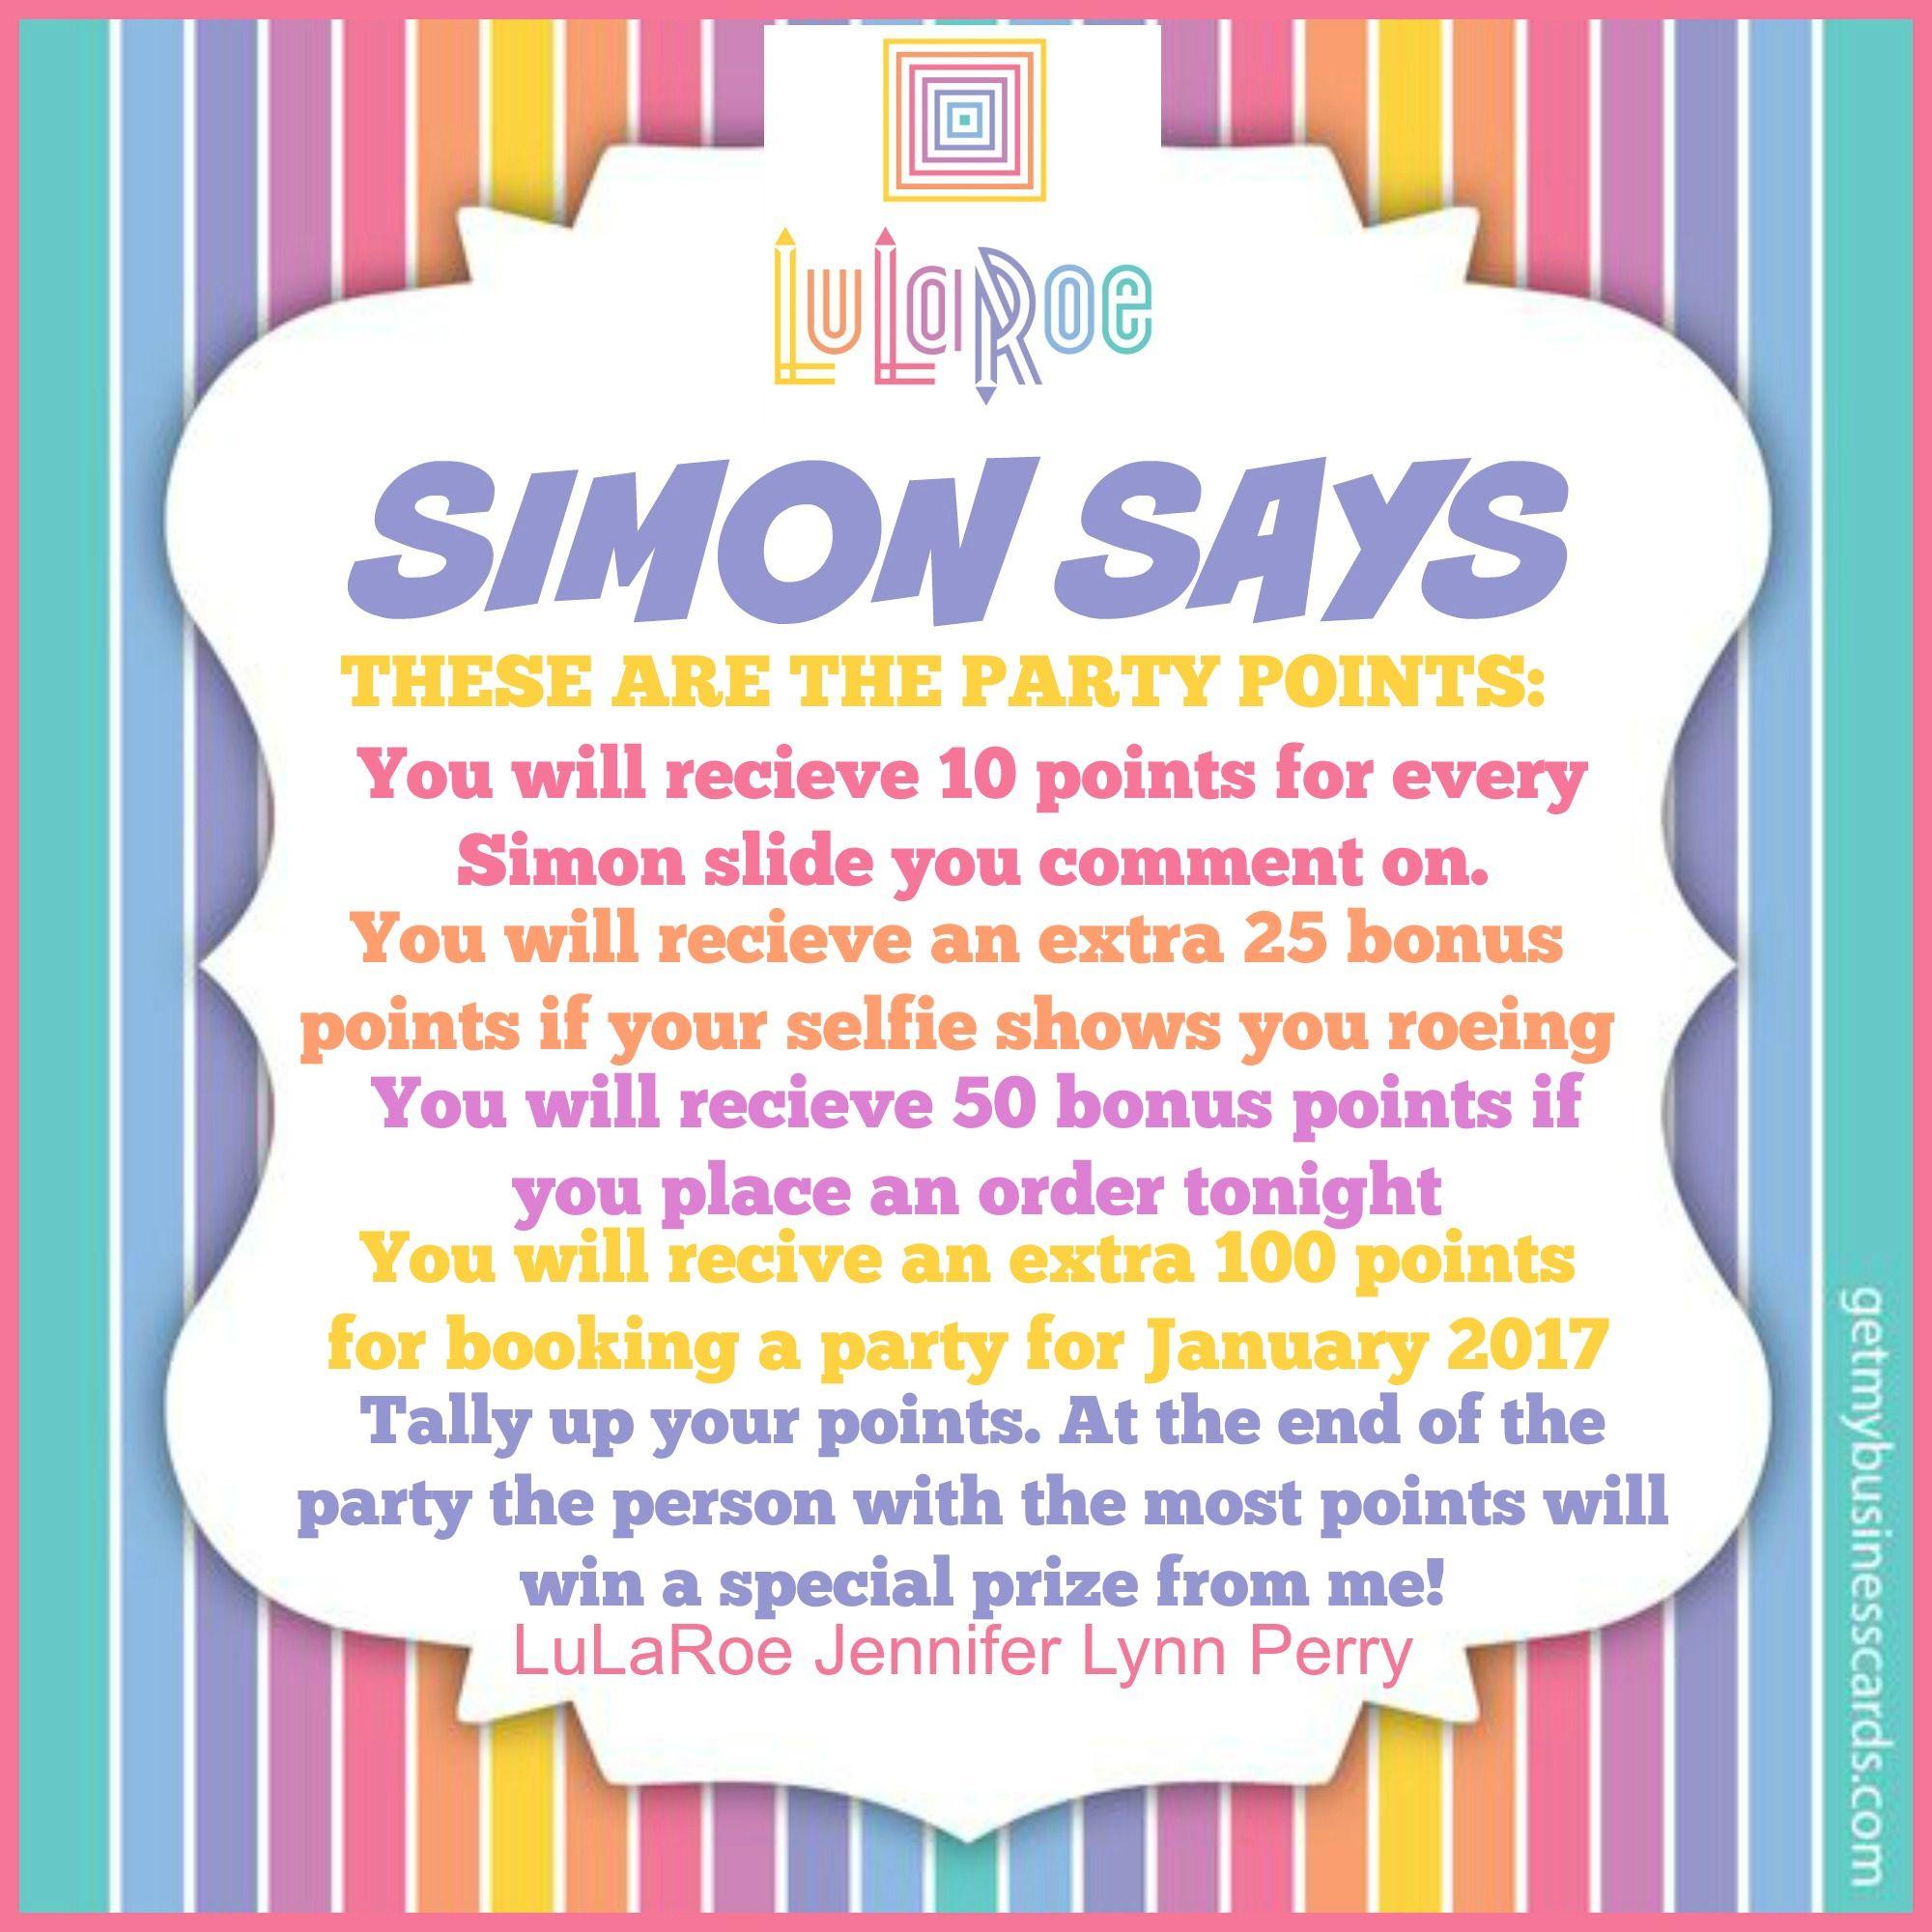 Simon Says game (slide 2) by LuLaRoe Jennifer Lynn Perry